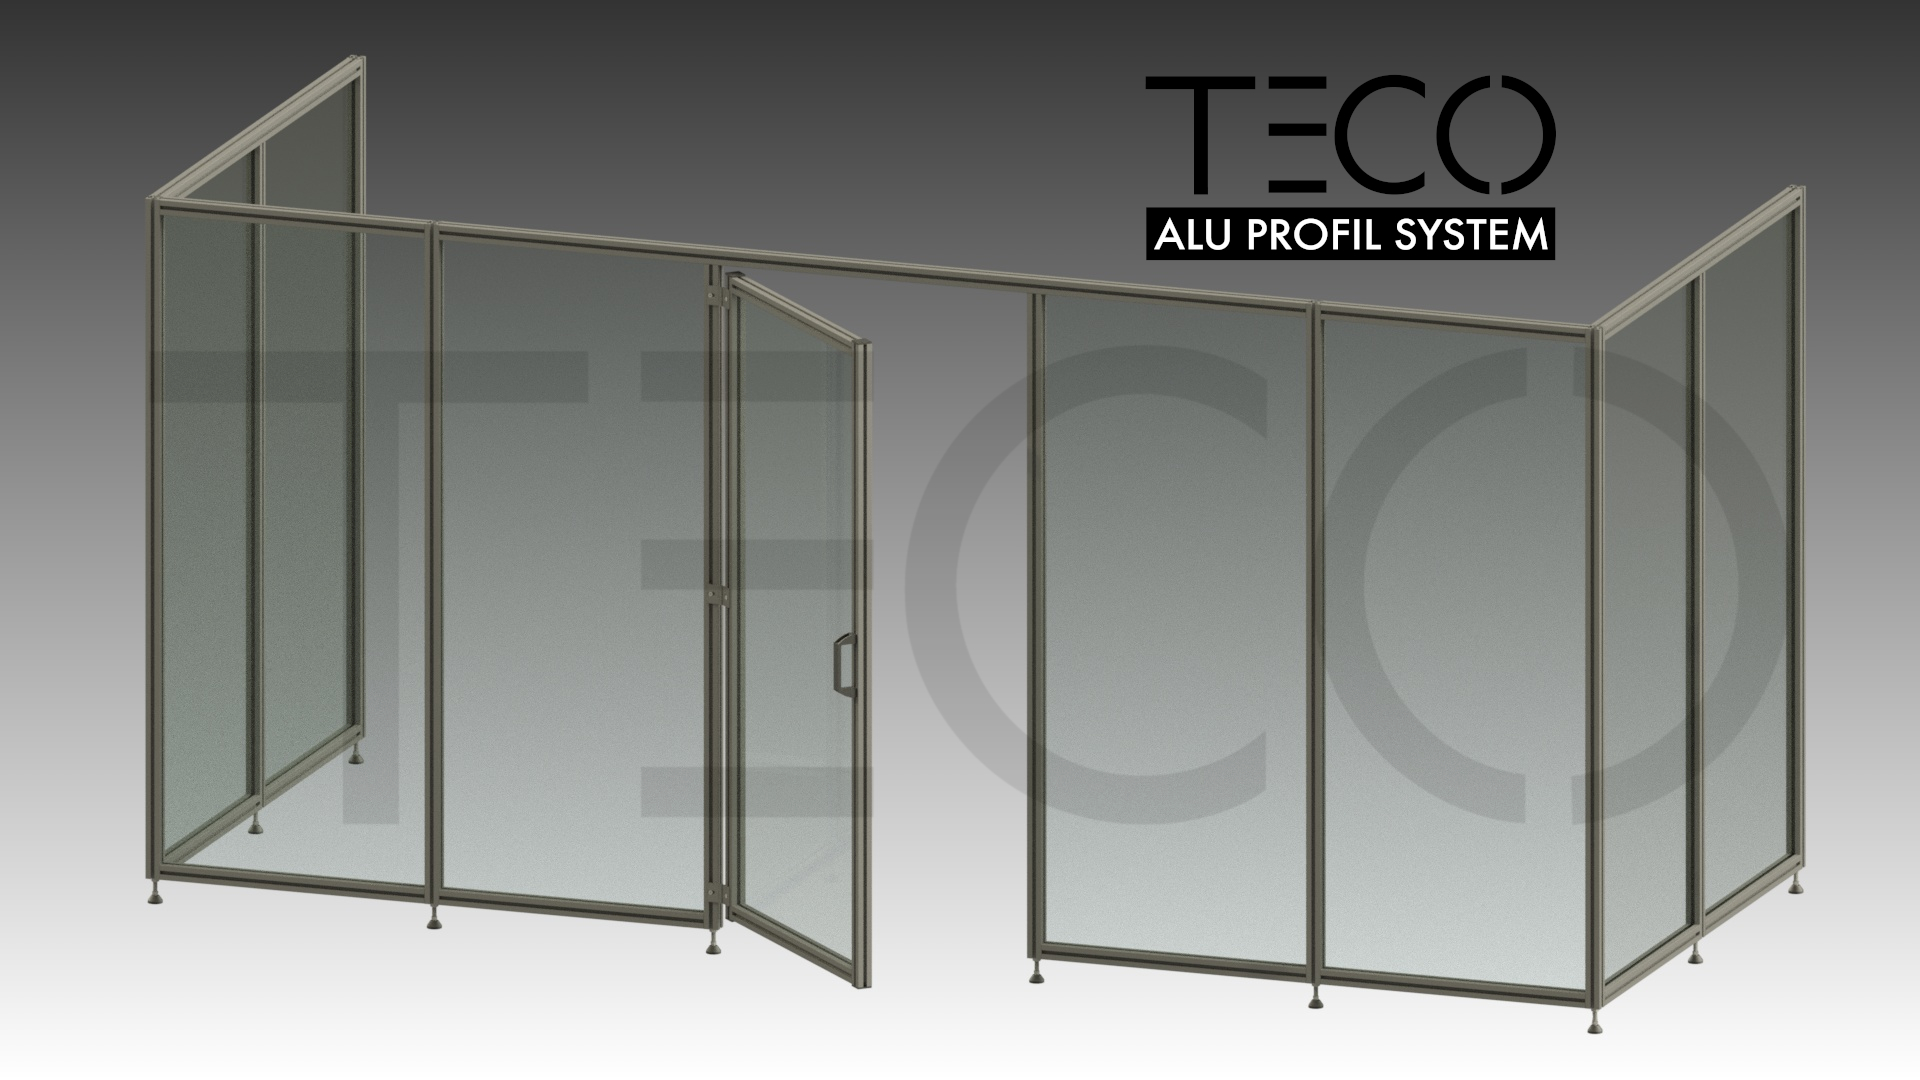 TECO Alu Profil System Schutzzaunelemente